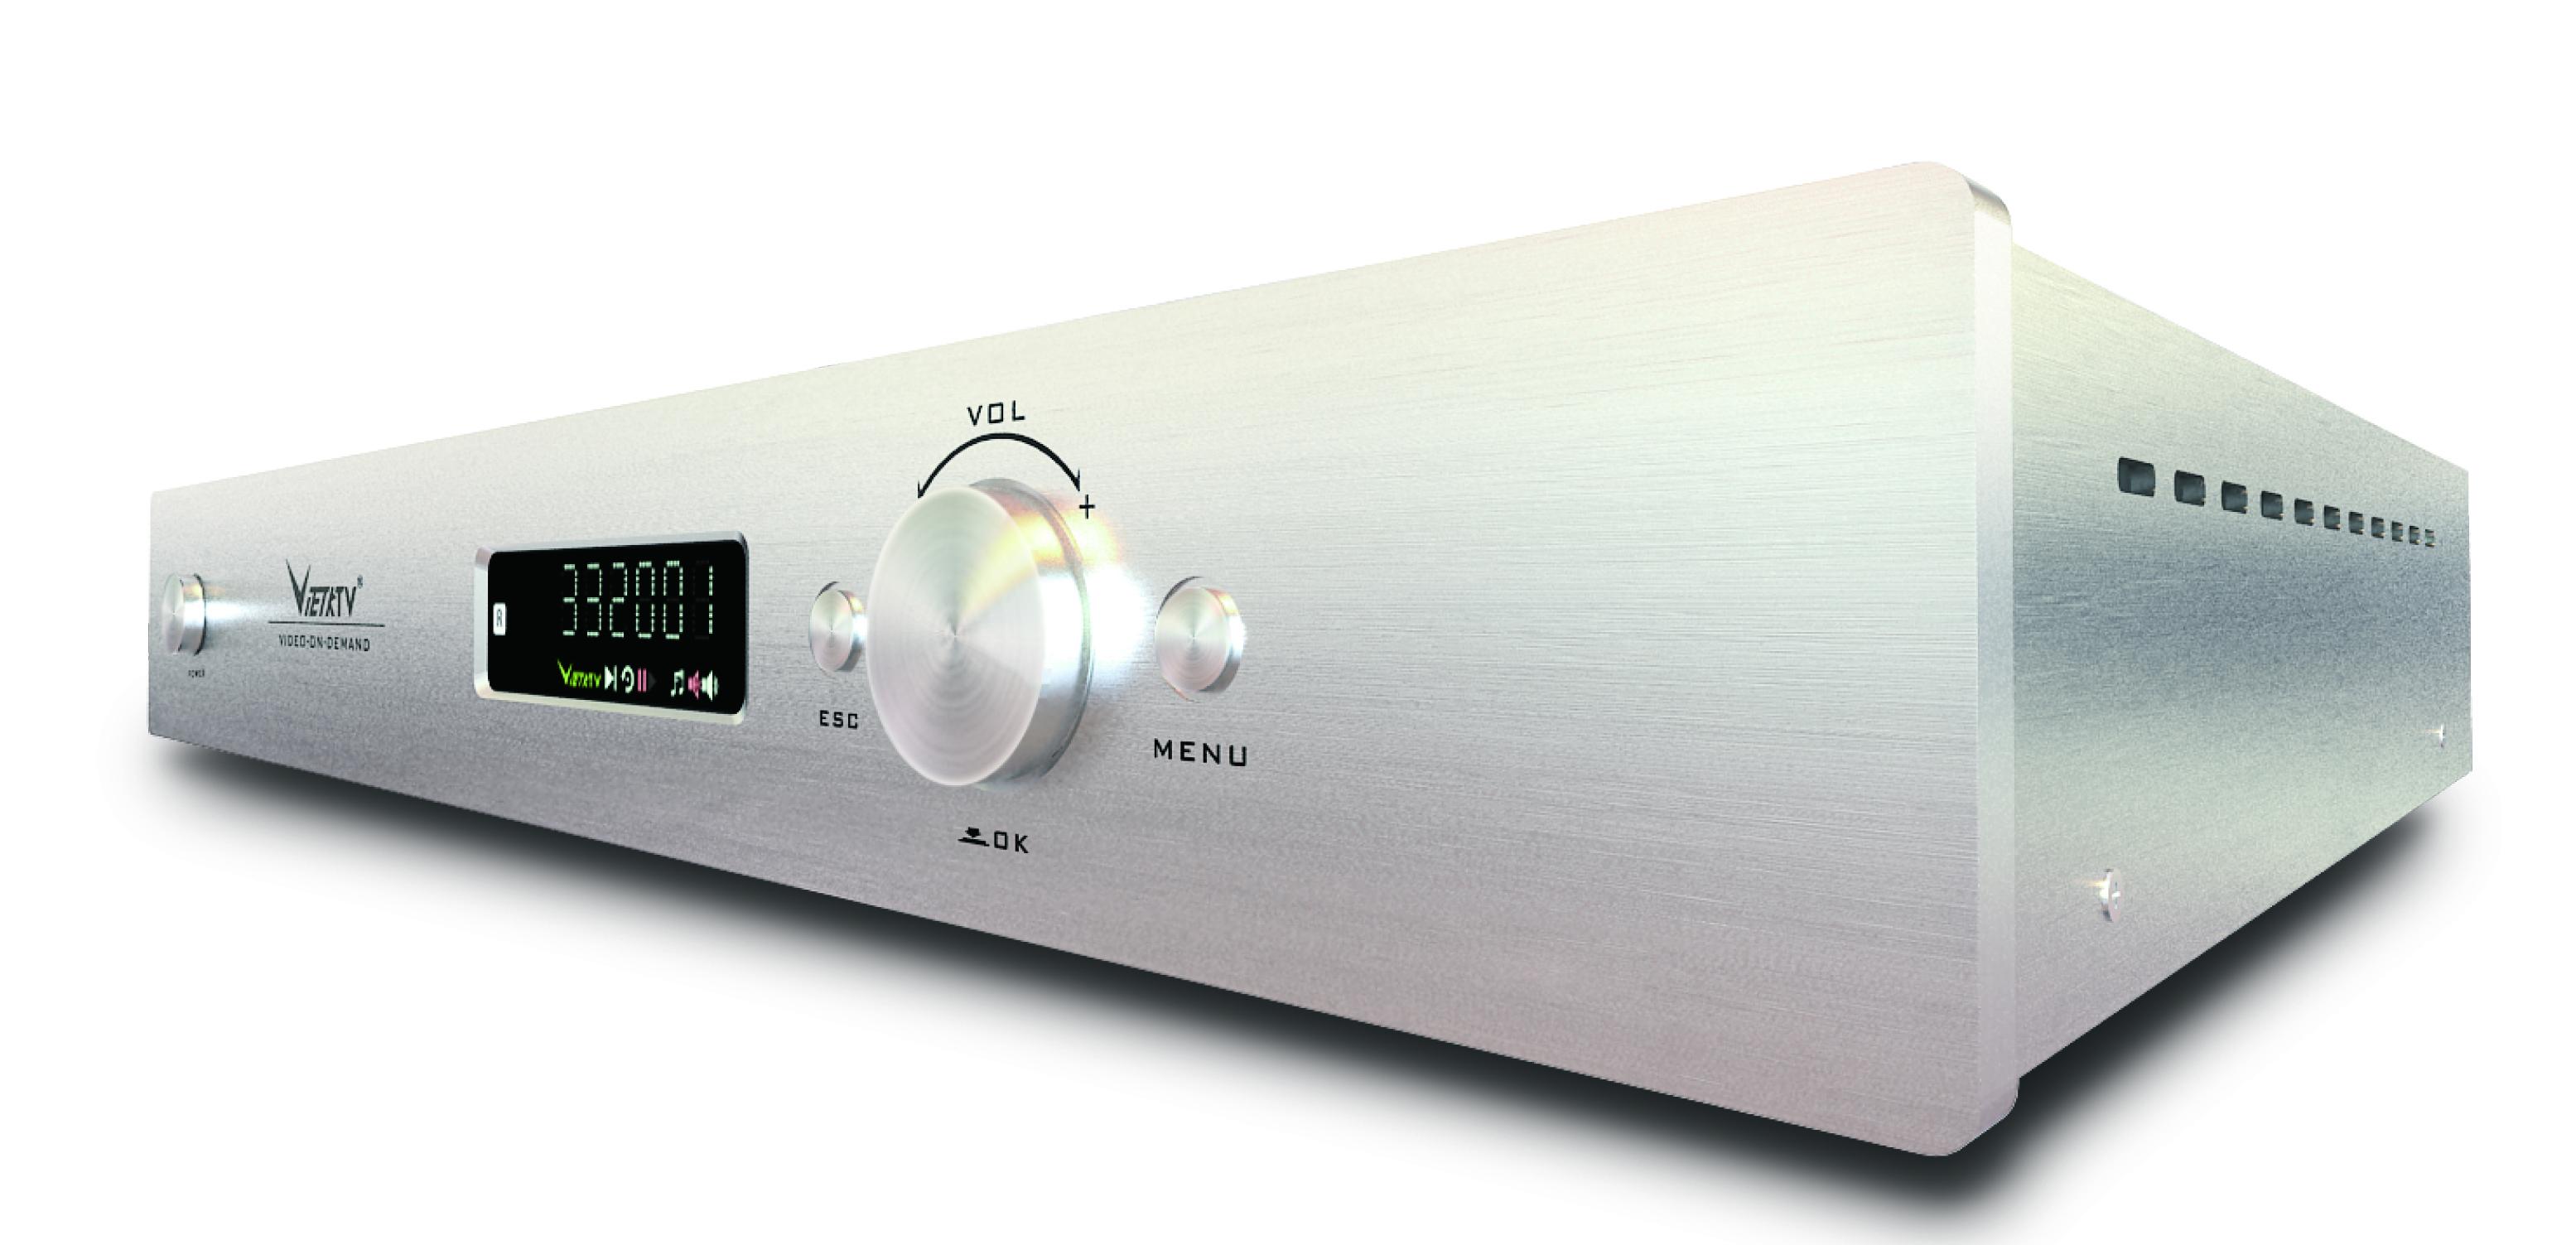 VK080包装盒436x310x140-白-A-2-9.4-转曲